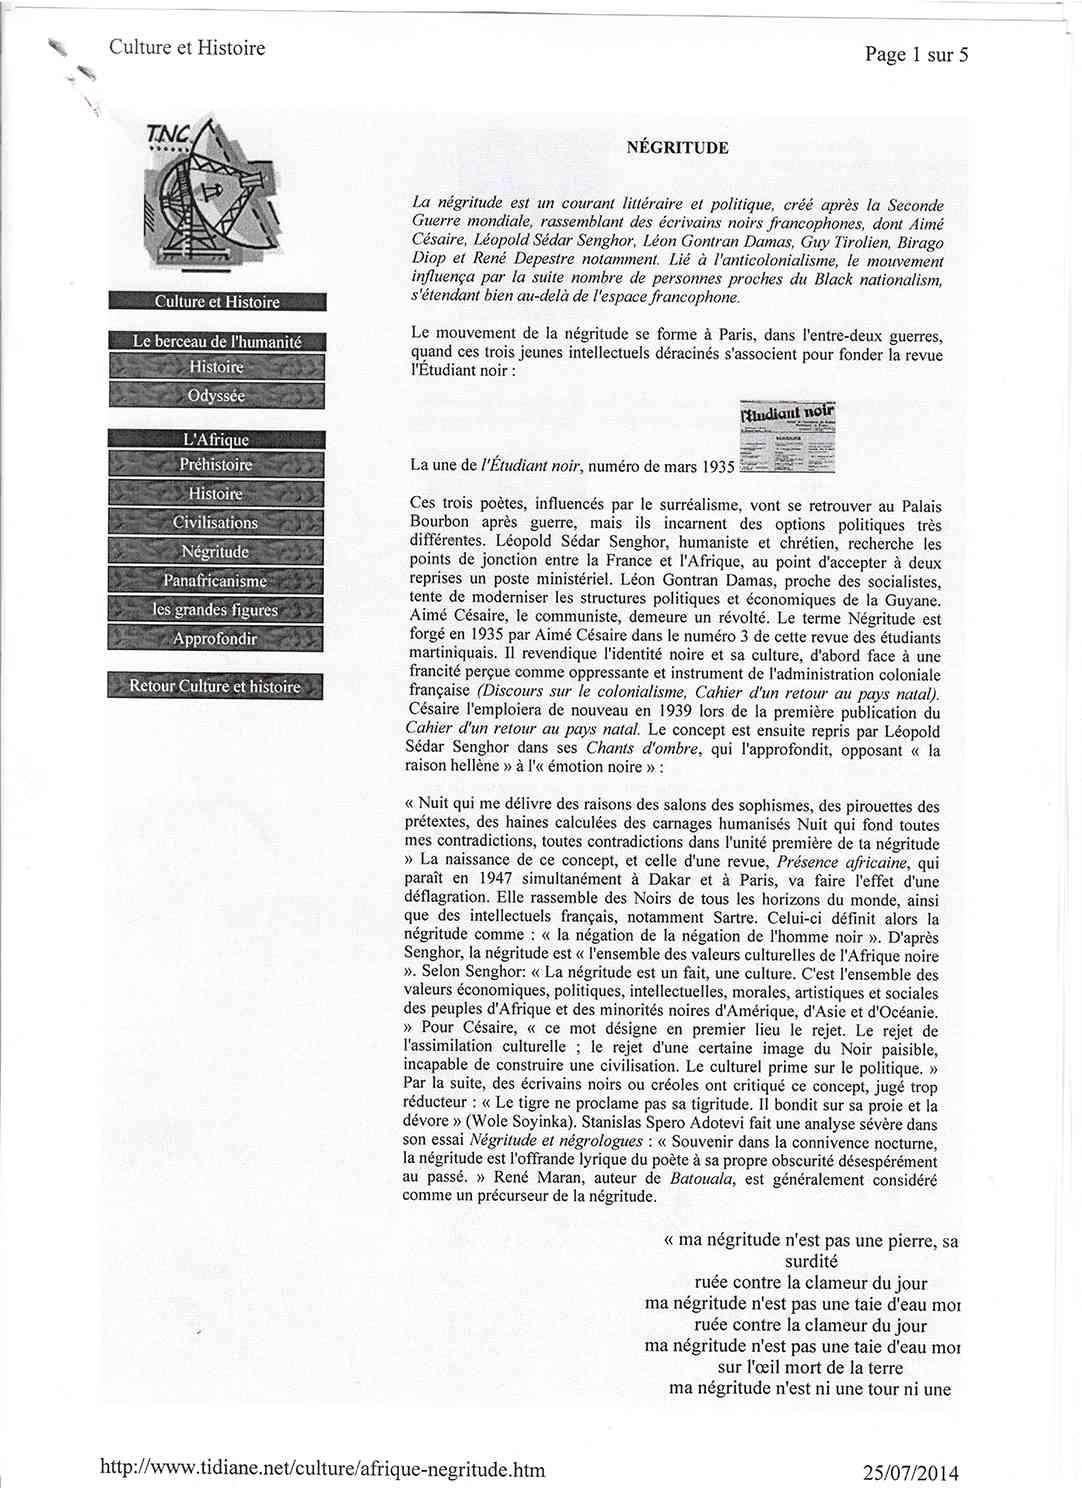 Page 1 Négritude, René Maran